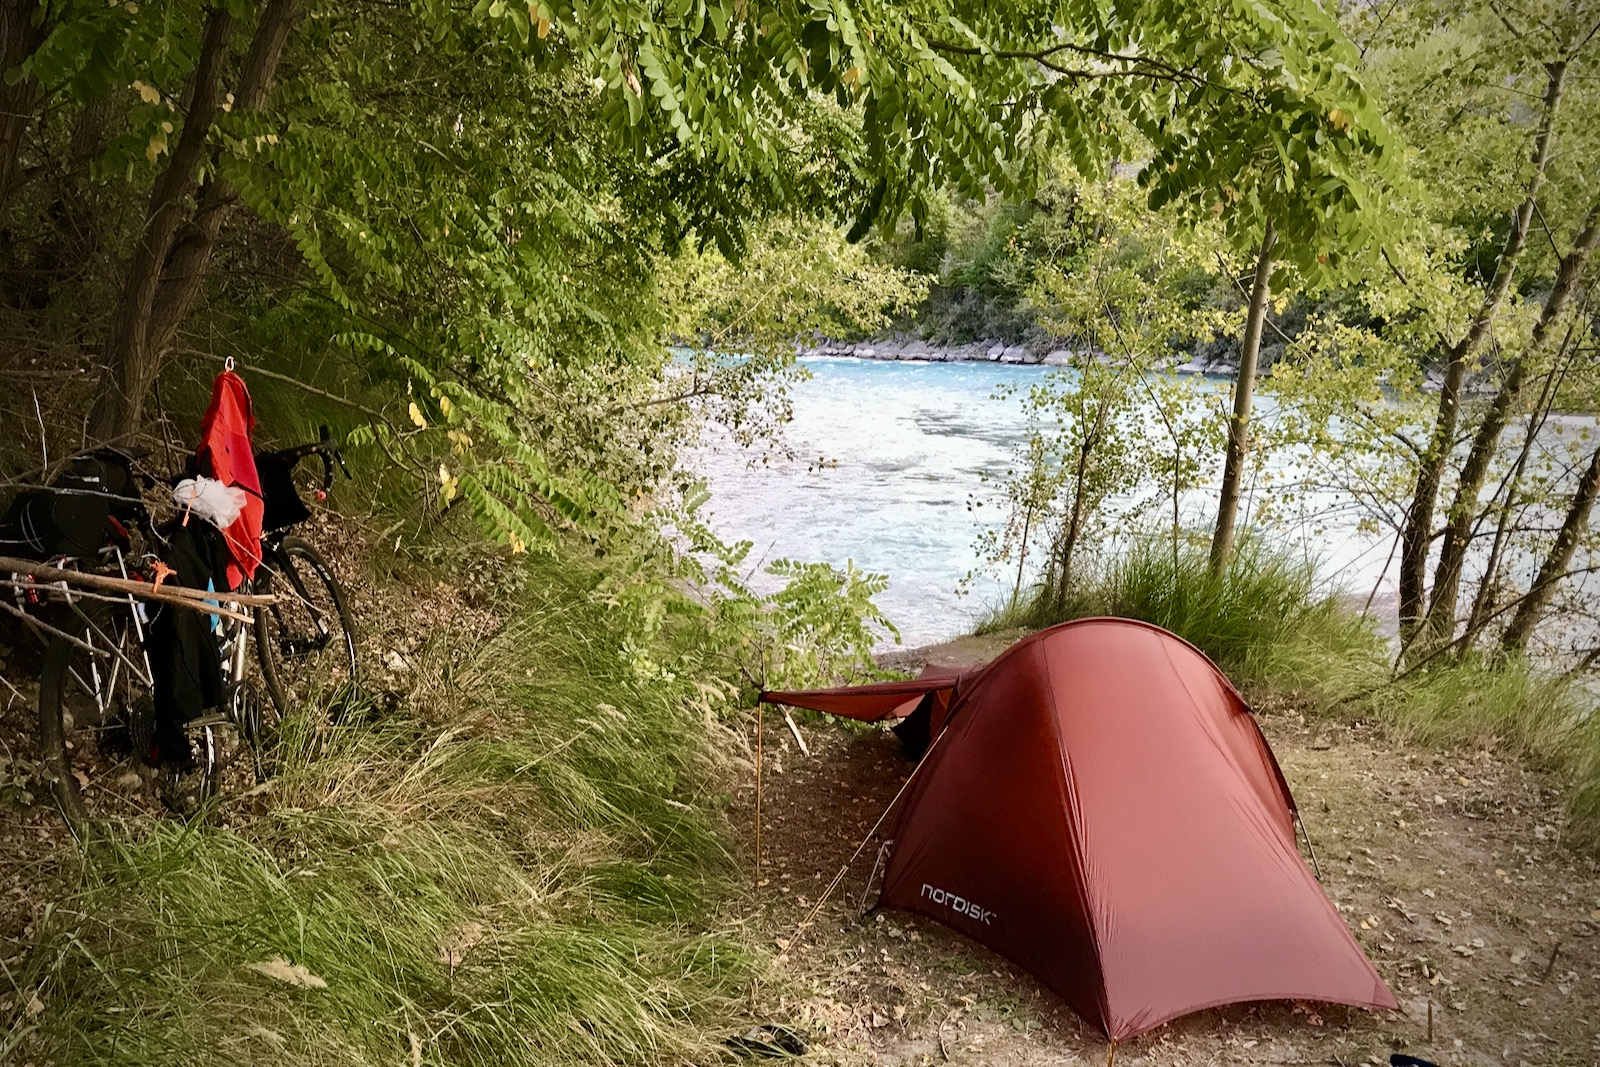 Wild camping France - Tim Wiggins